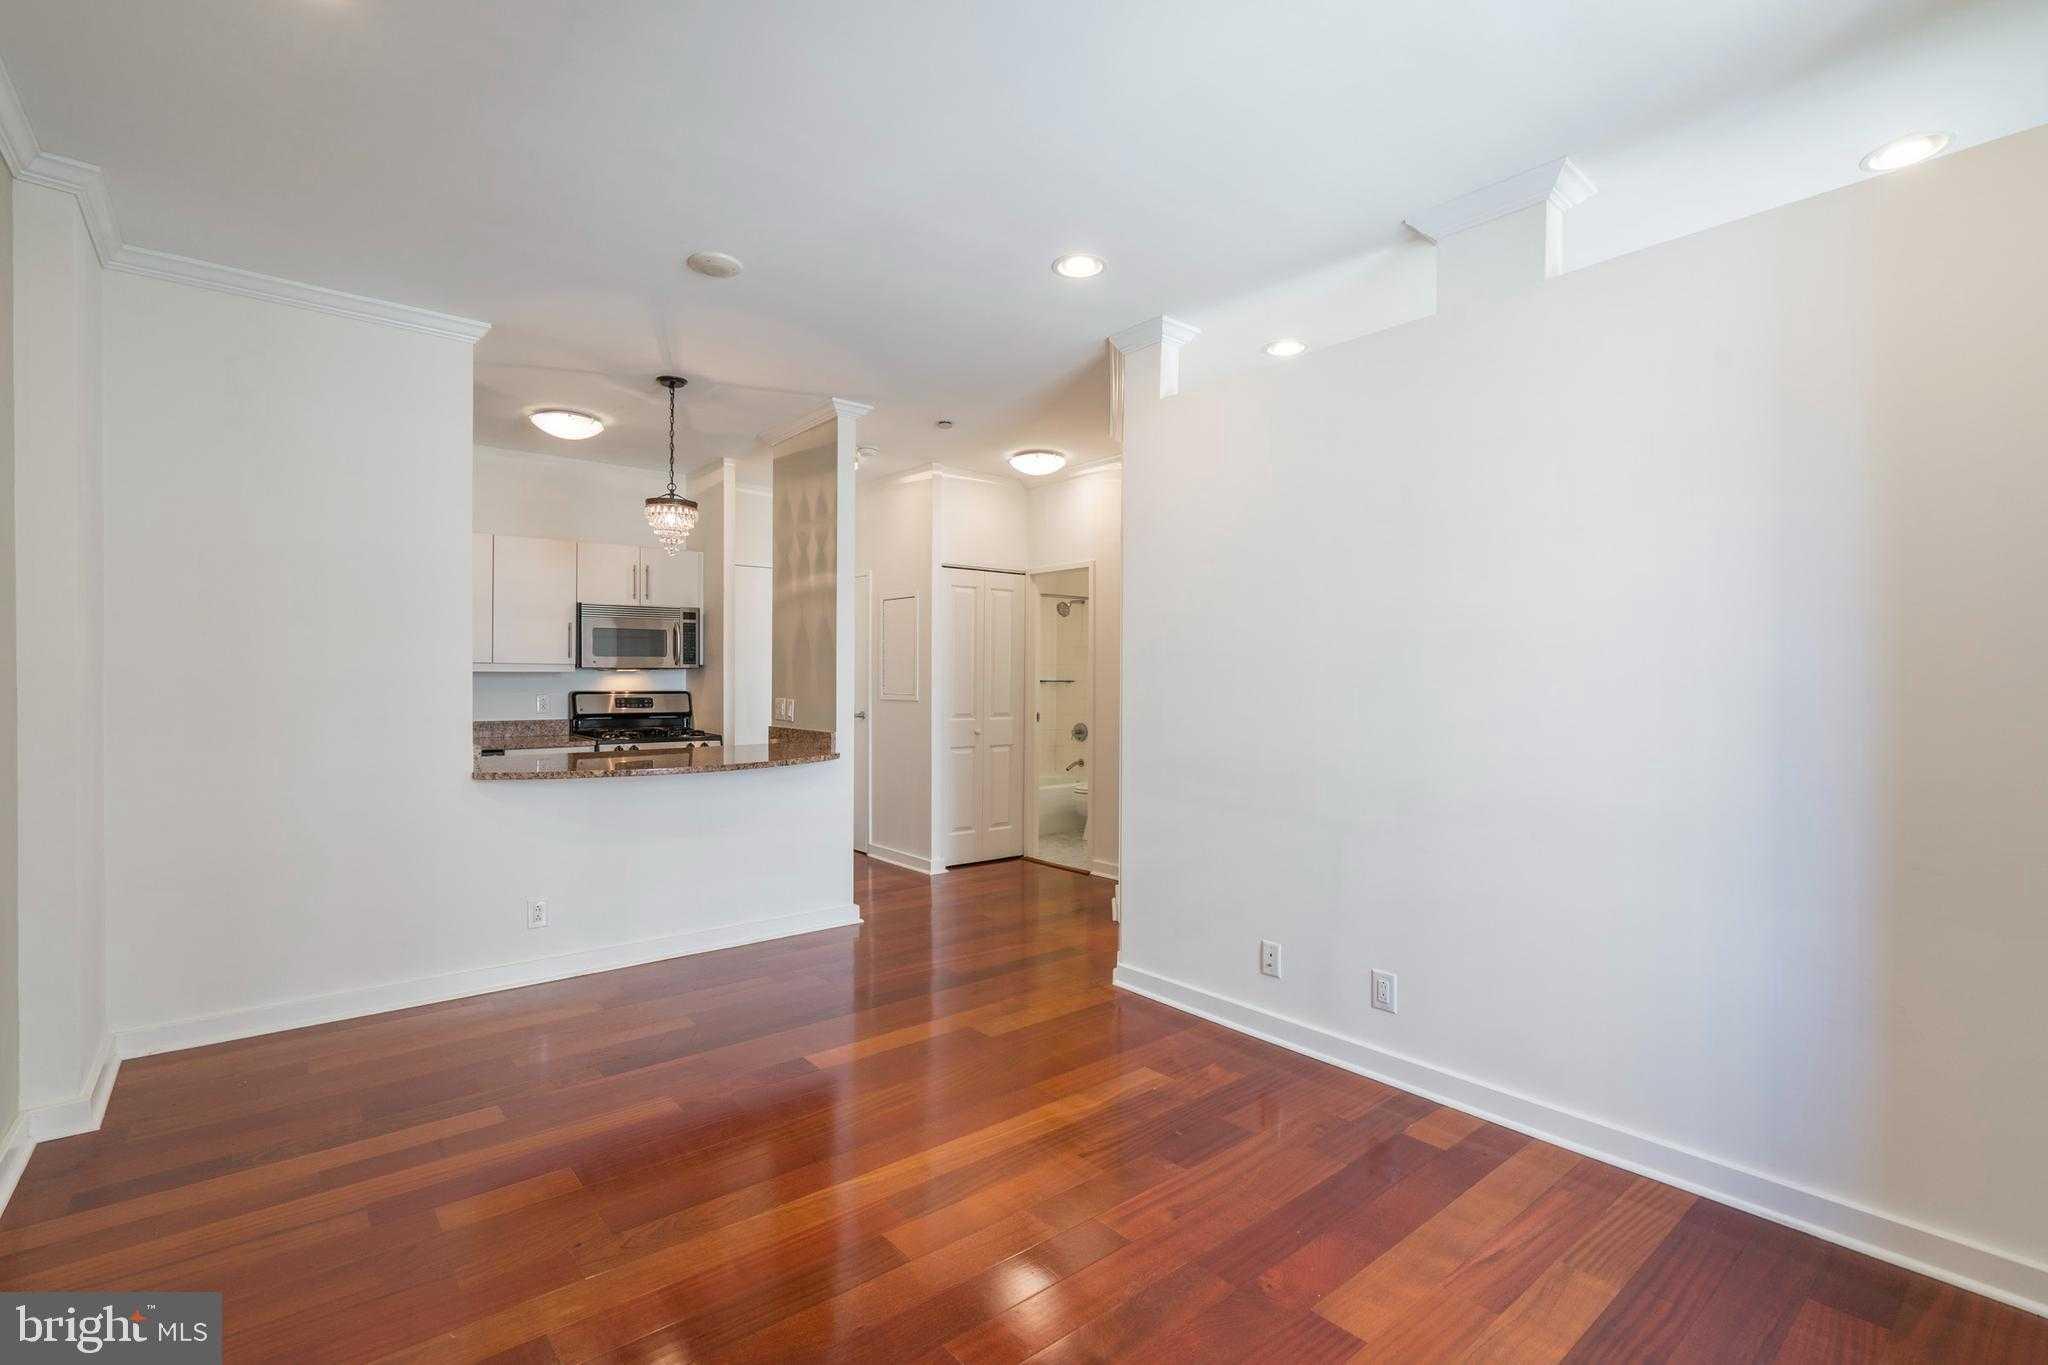 $269,000 - 1Br/1Ba -  for Sale in Rittenhouse Square, Philadelphia